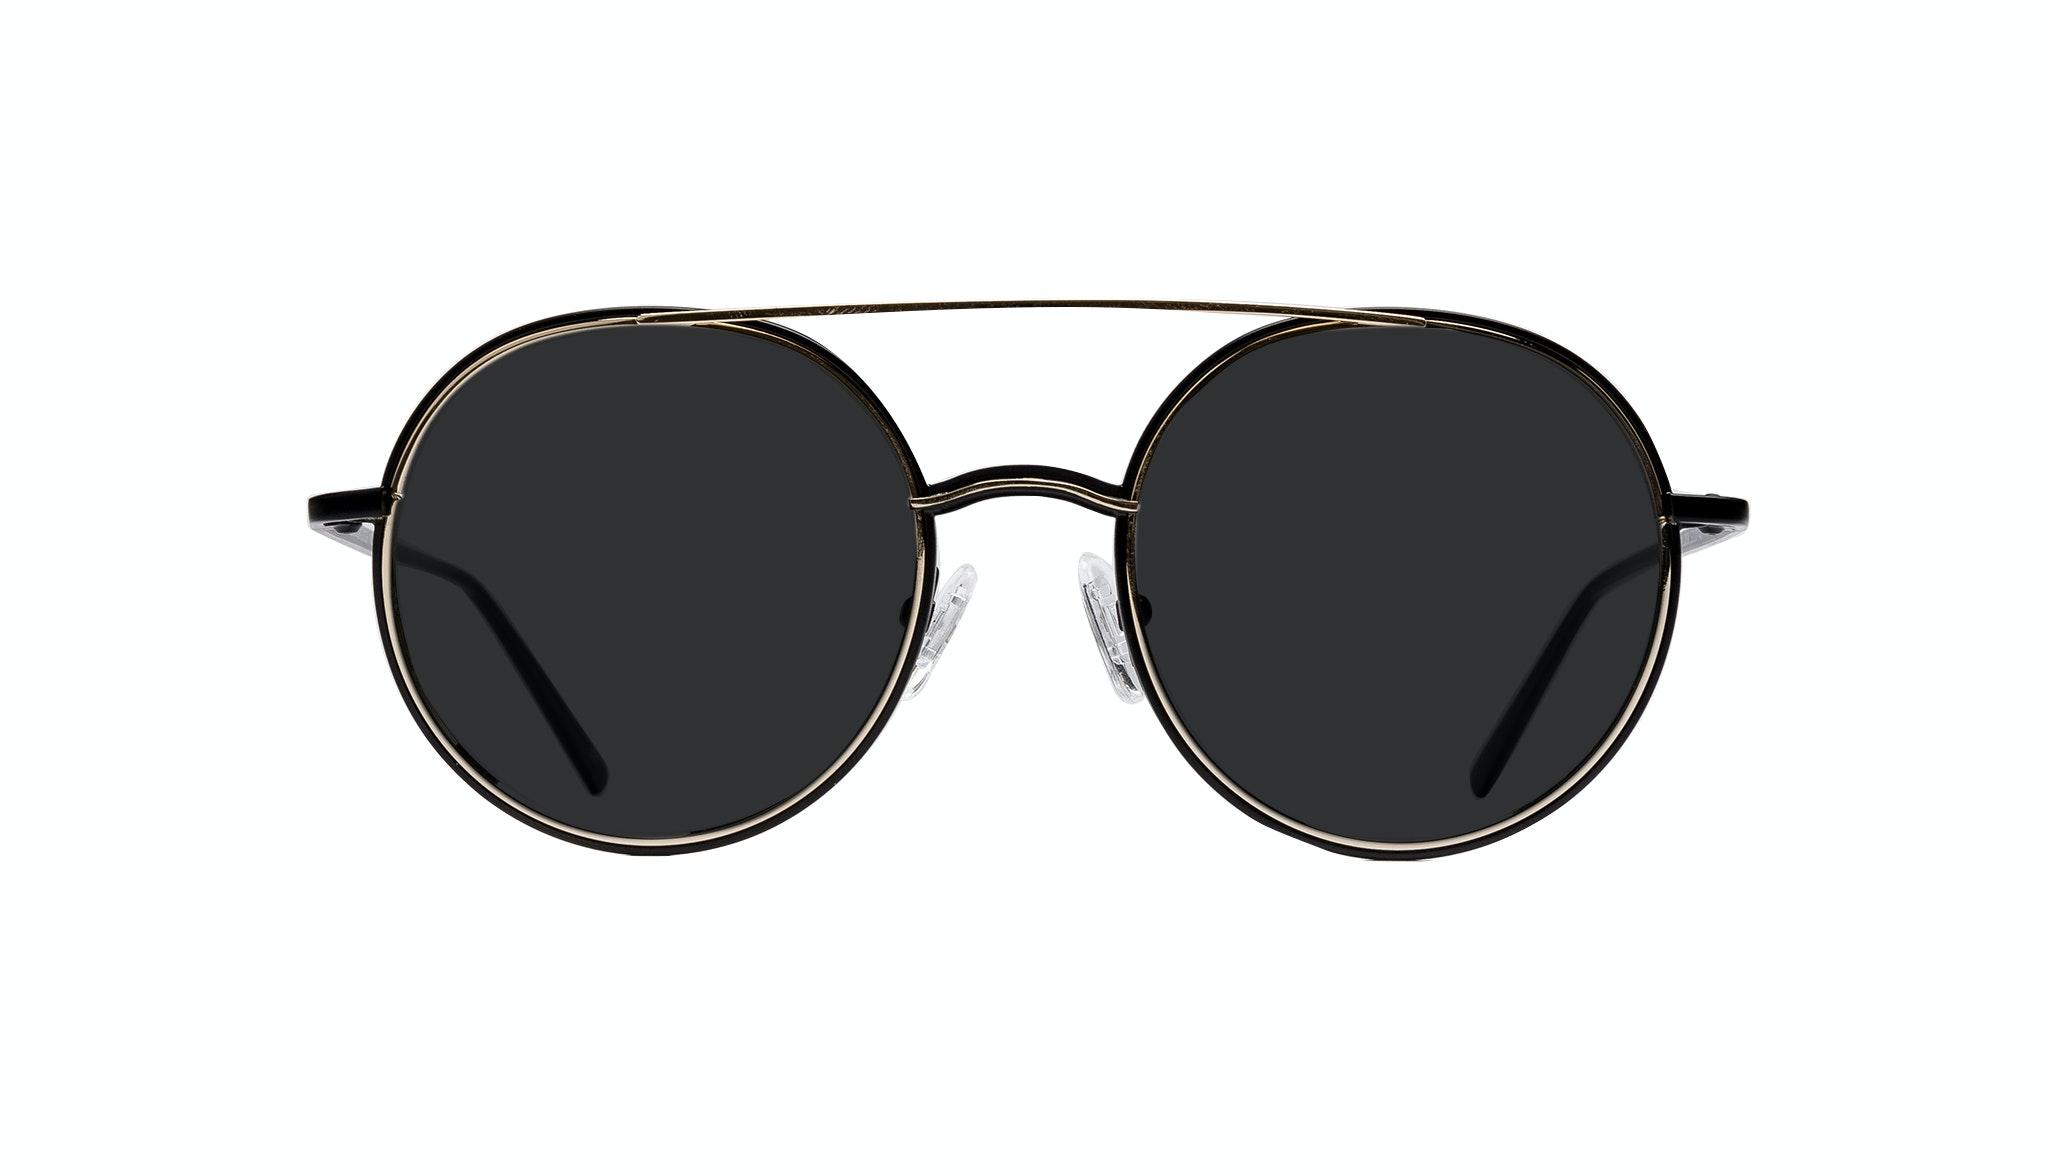 Affordable Fashion Glasses Aviator Sunglasses Women Scarborough Money Bag Front